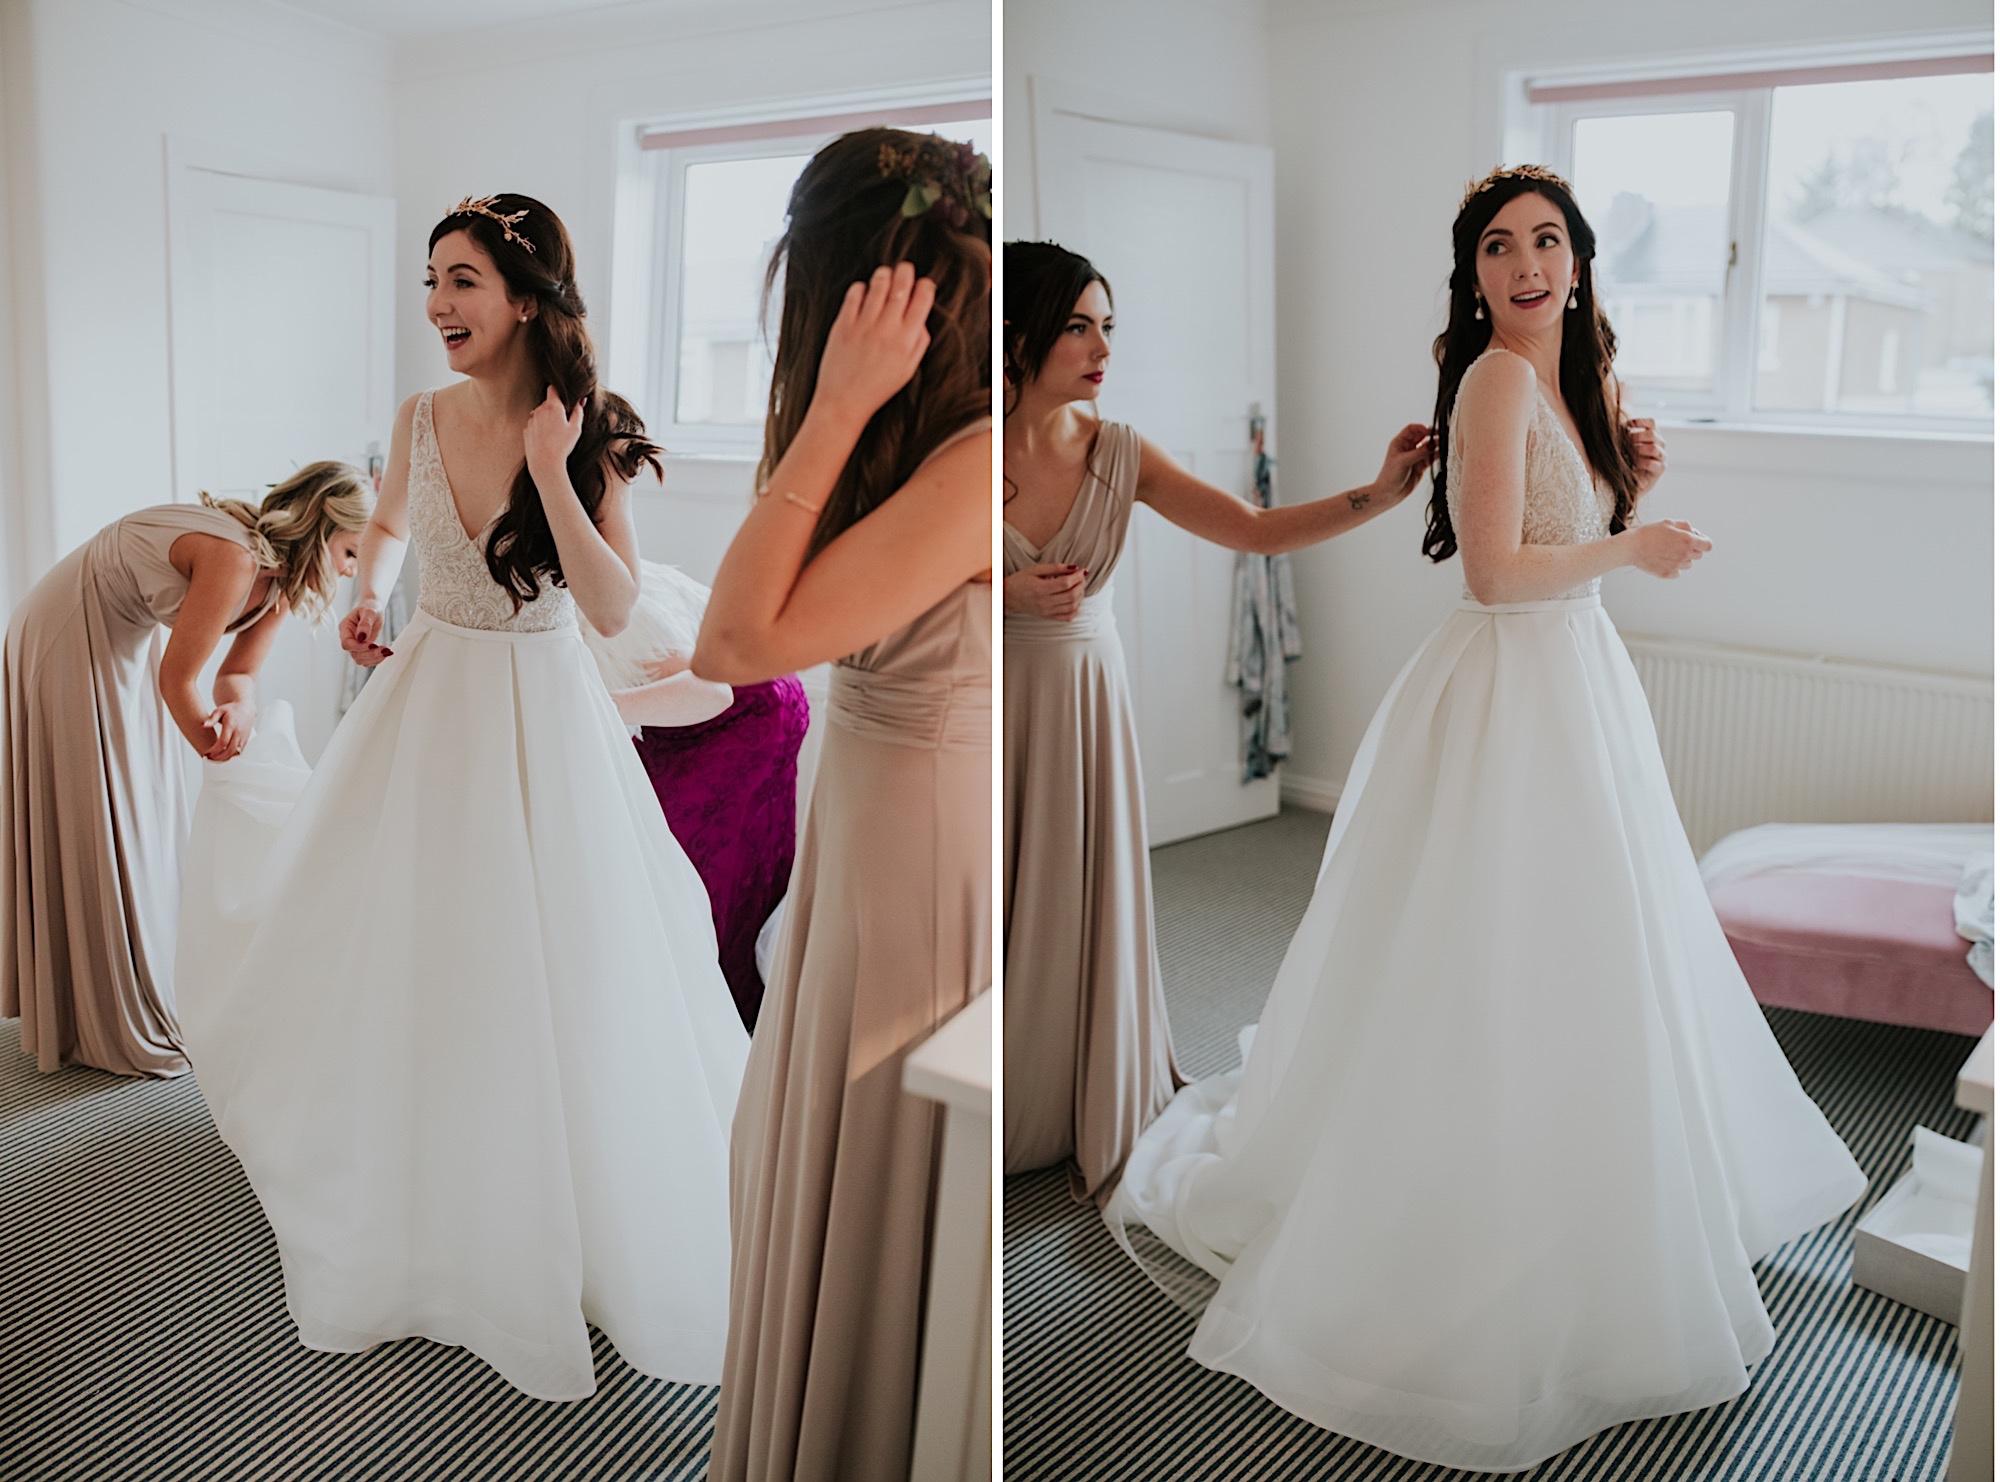 bride having her wedding dress buttoned up